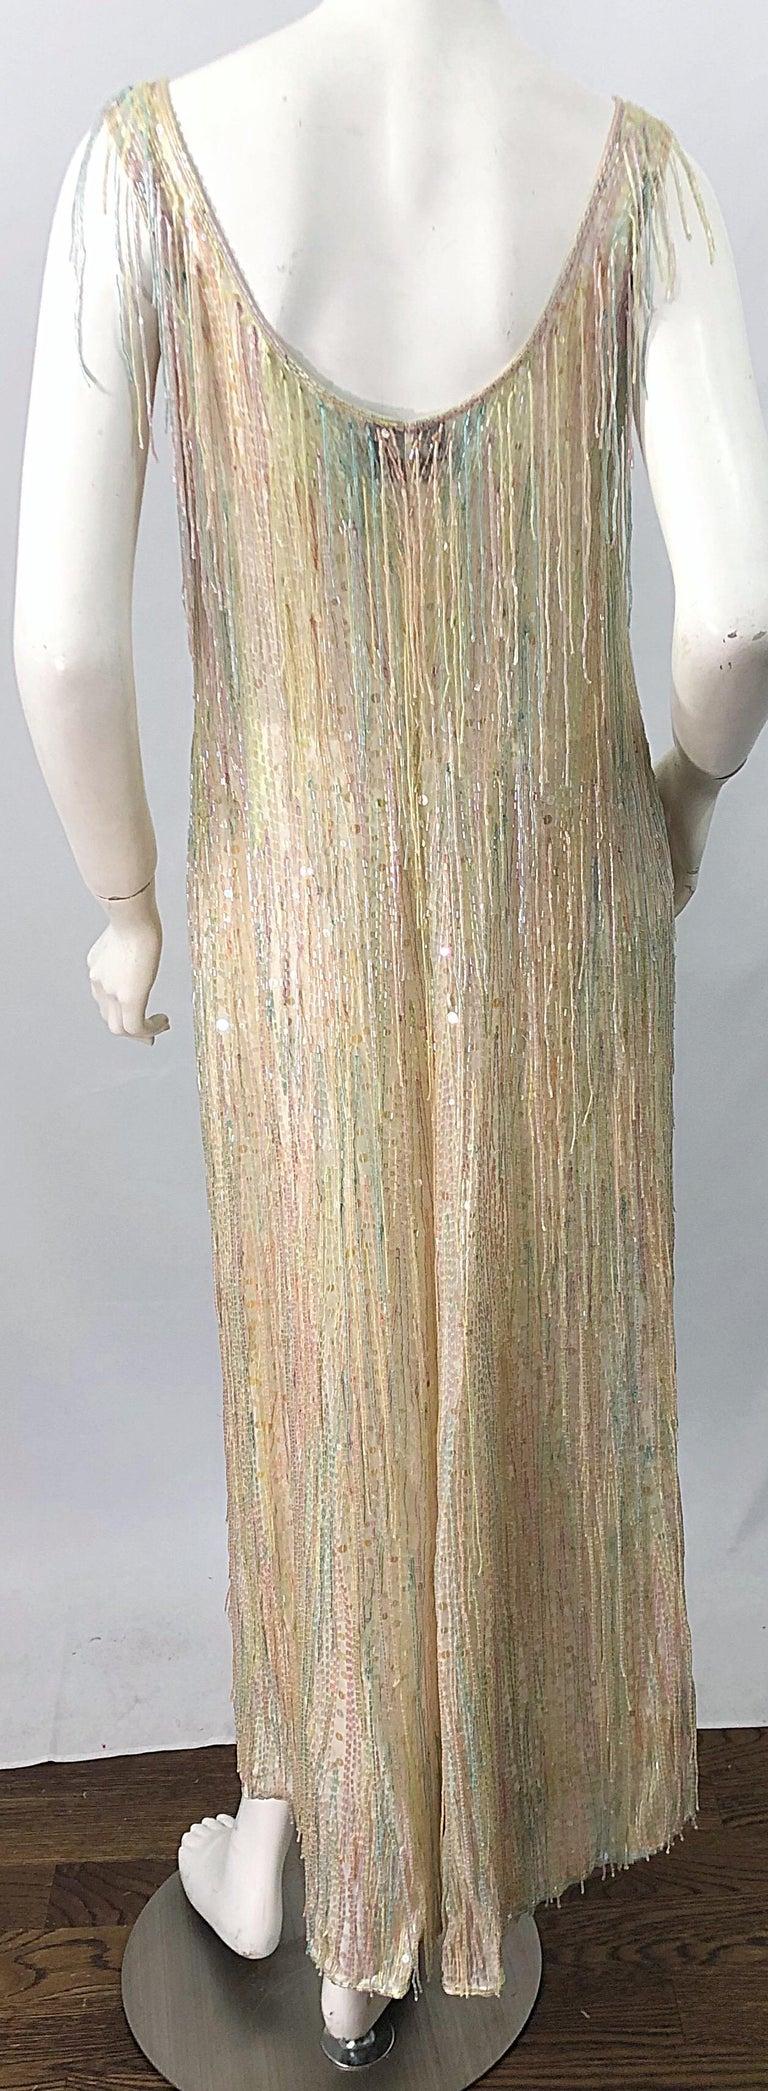 Halston MET Musuem 1970s Fully Fringed Beaded Flapper Style Vintage 70s Dress For Sale 14